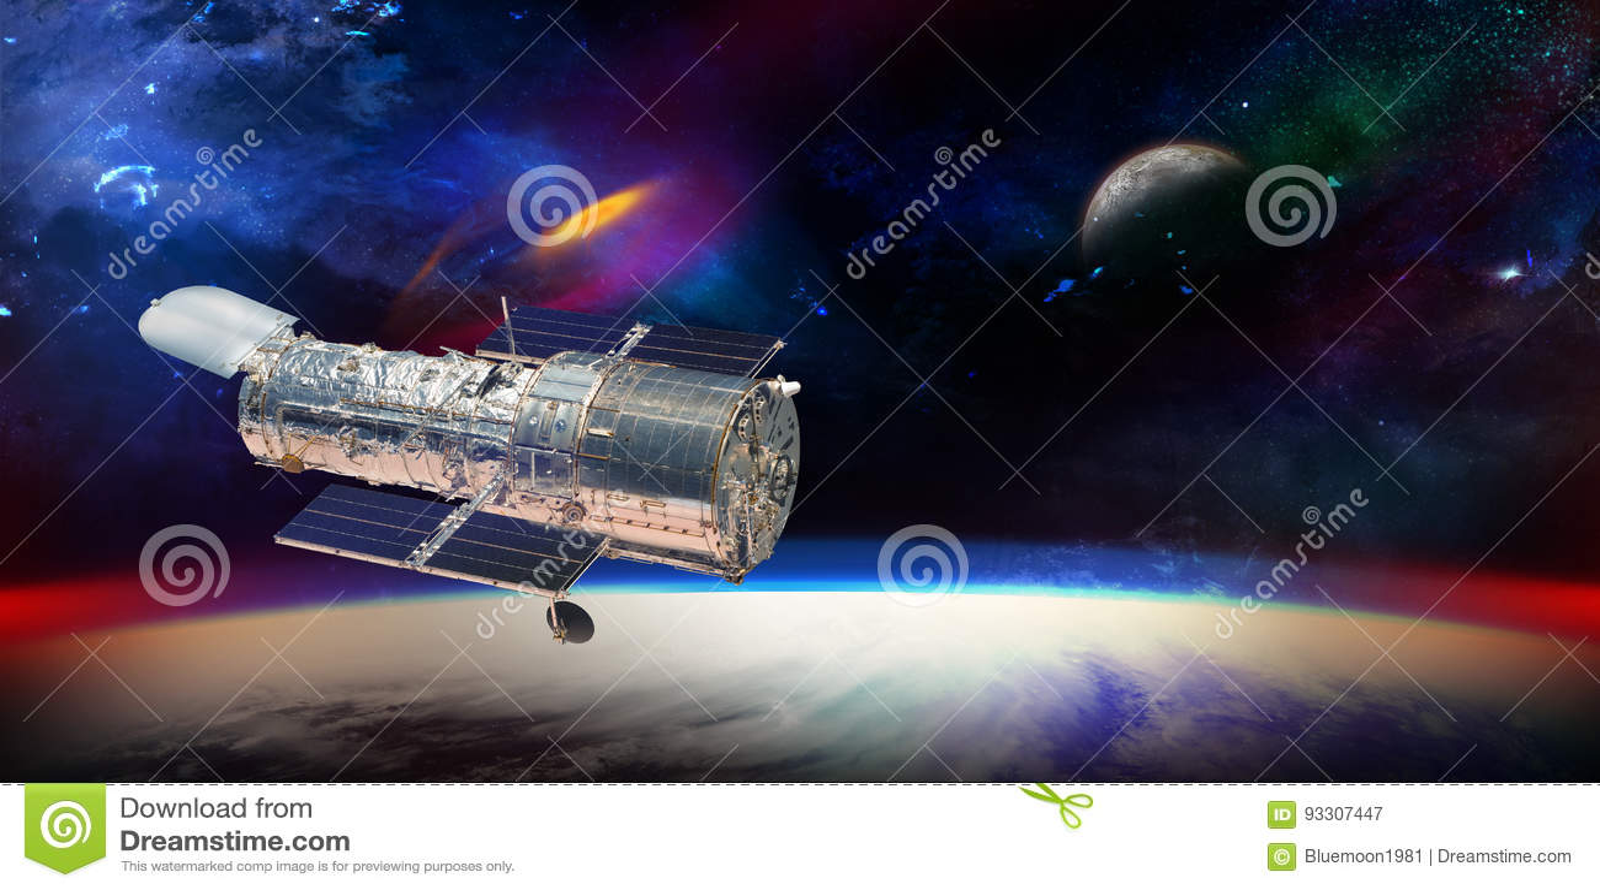 Hubble teleskop bestärkt riesen exomond u alpha cephei